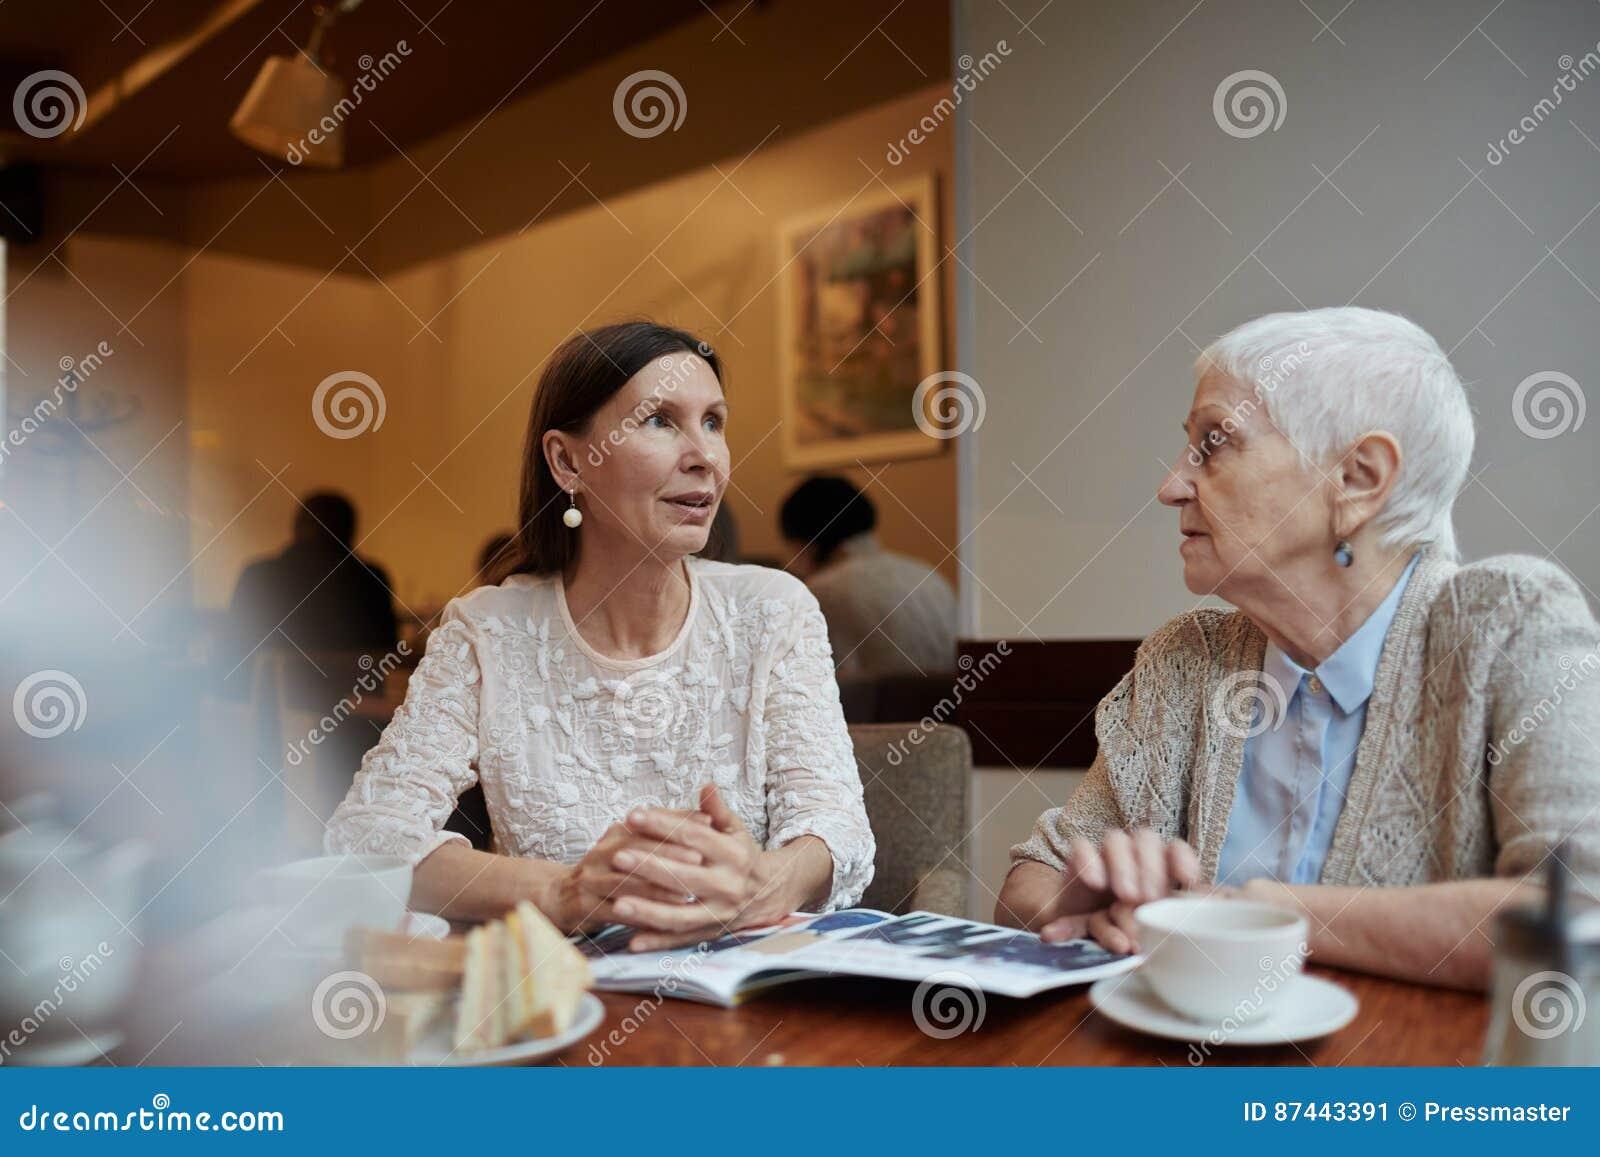 Talking to females